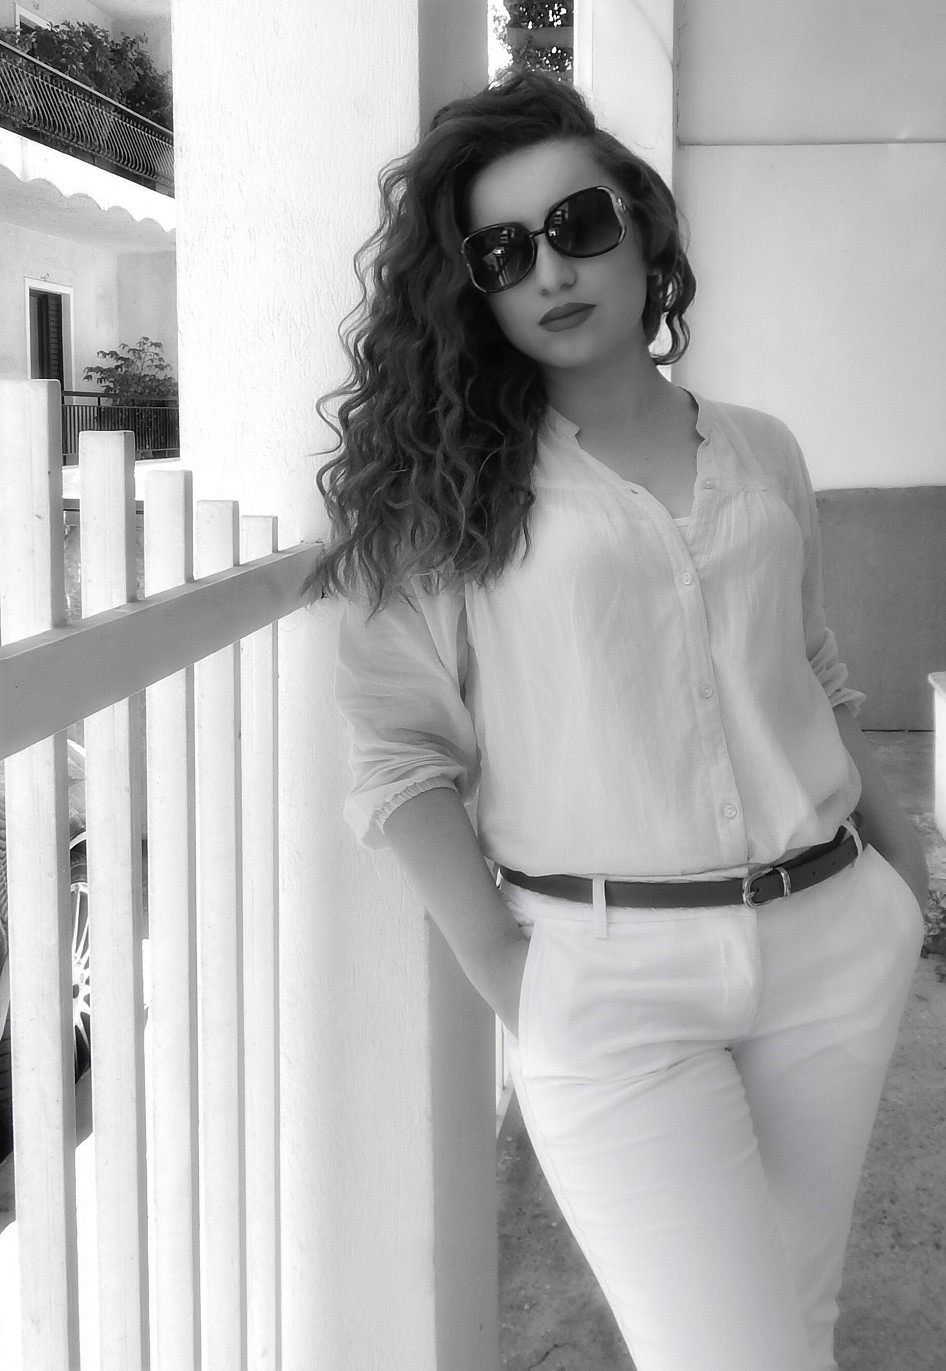 lorena_stroka_instagram_facebook_biografia_albstroka_blog (1)